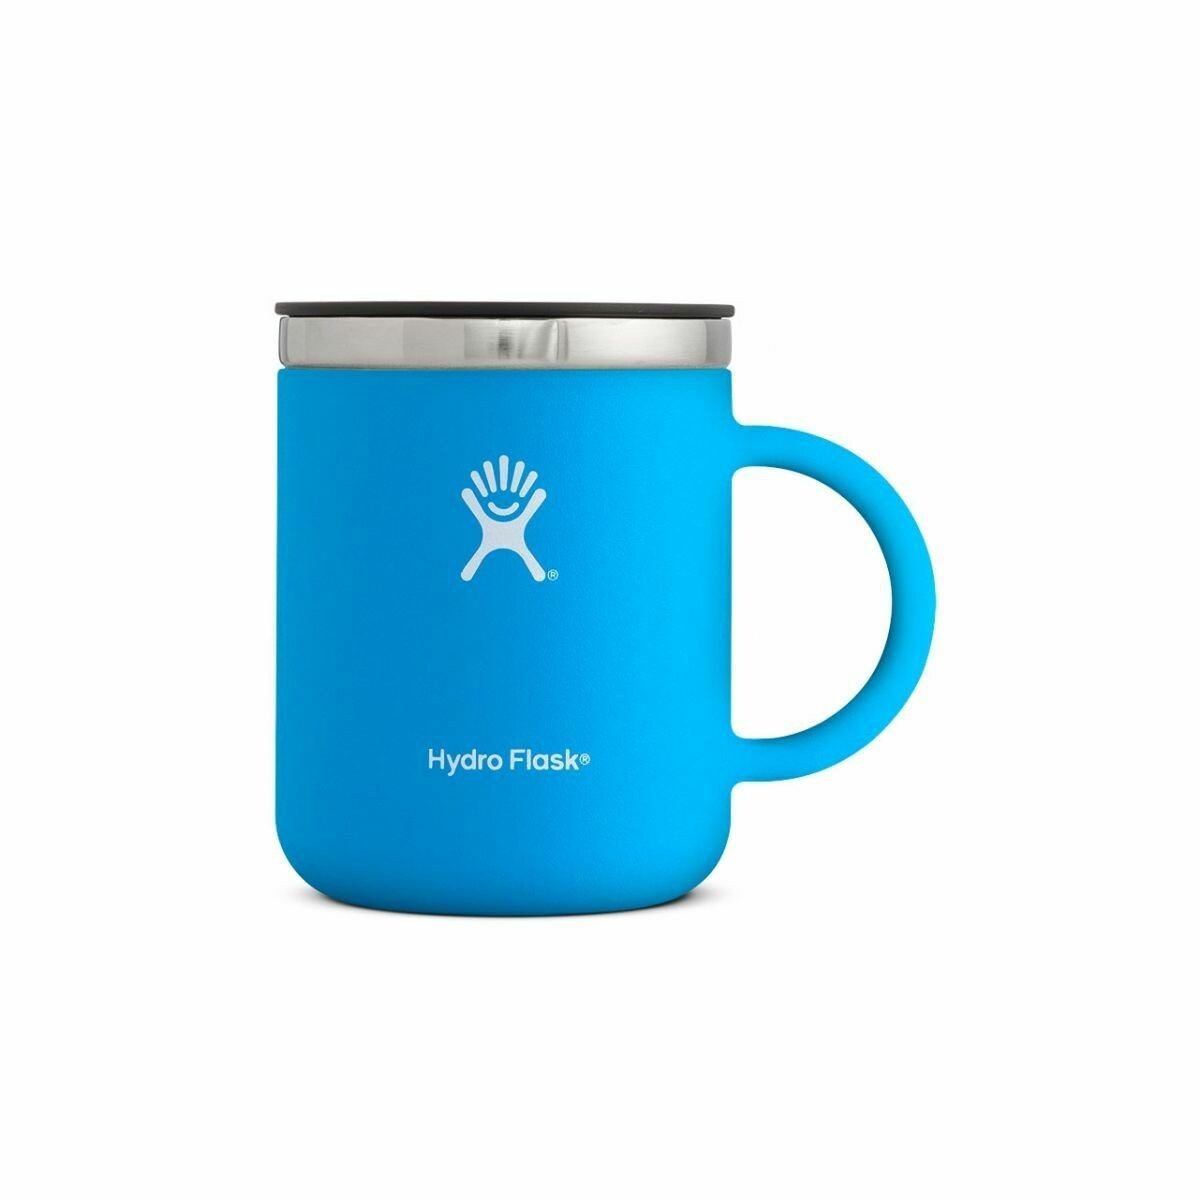 Hydro Flask 12 oz Coffee Mug PACIFIC